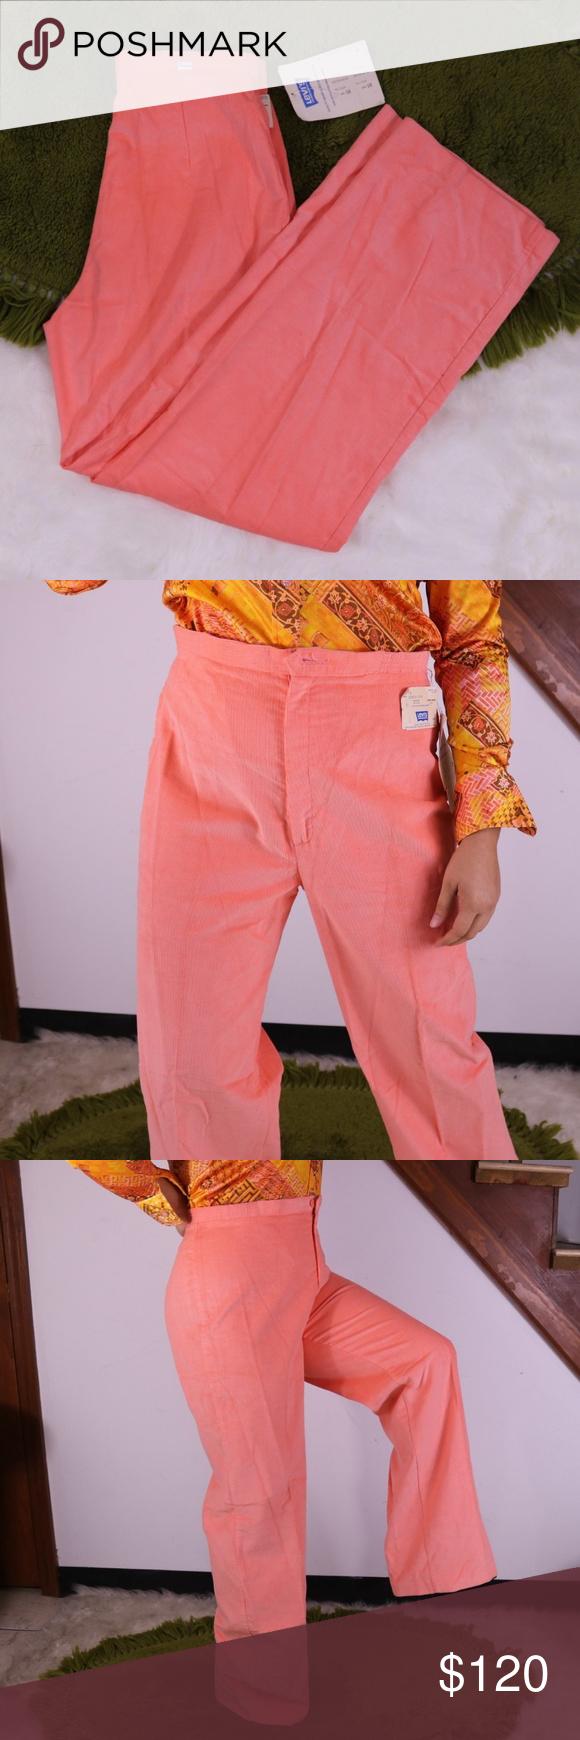 NWT Vintage 70s Levi Cord Pants